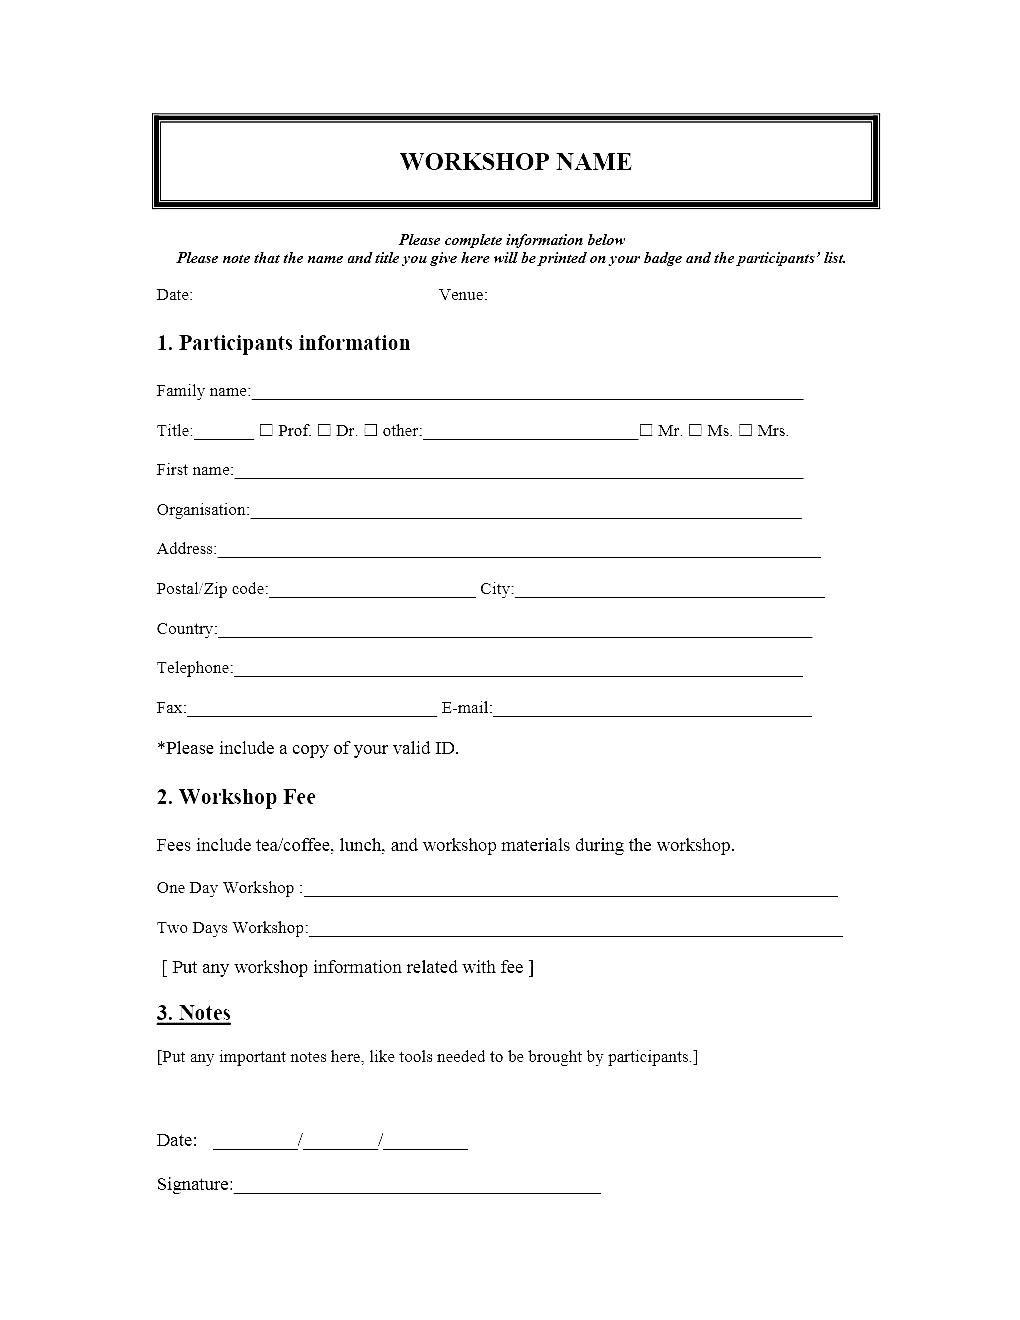 Event Registration Form Template Microsoft Word Within Seminar Registration Form Template Word